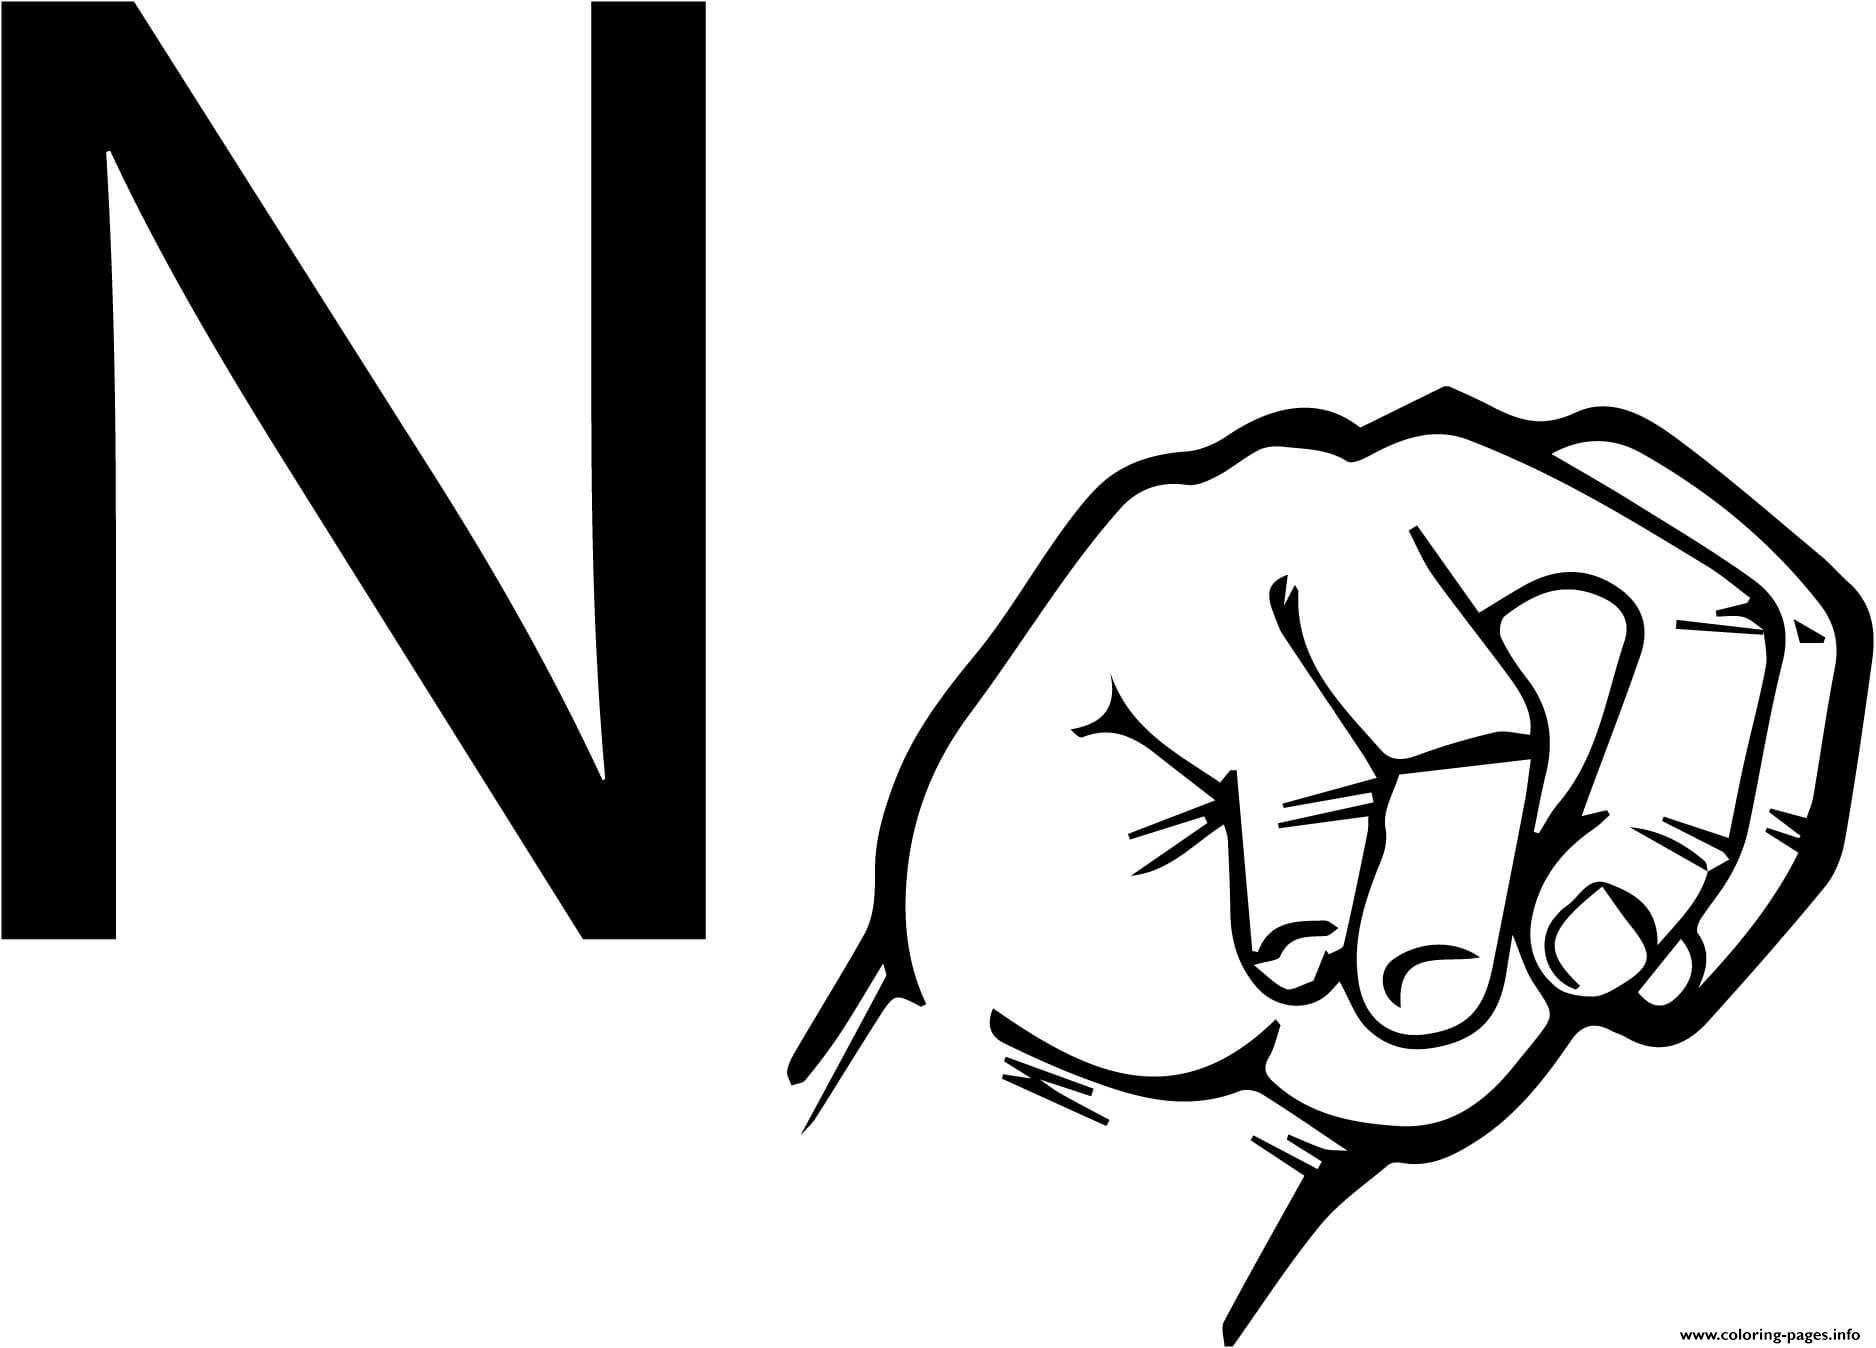 Alfabet Letters Kleurplaten Asl Sign Language Letter N Coloring Pages Printable